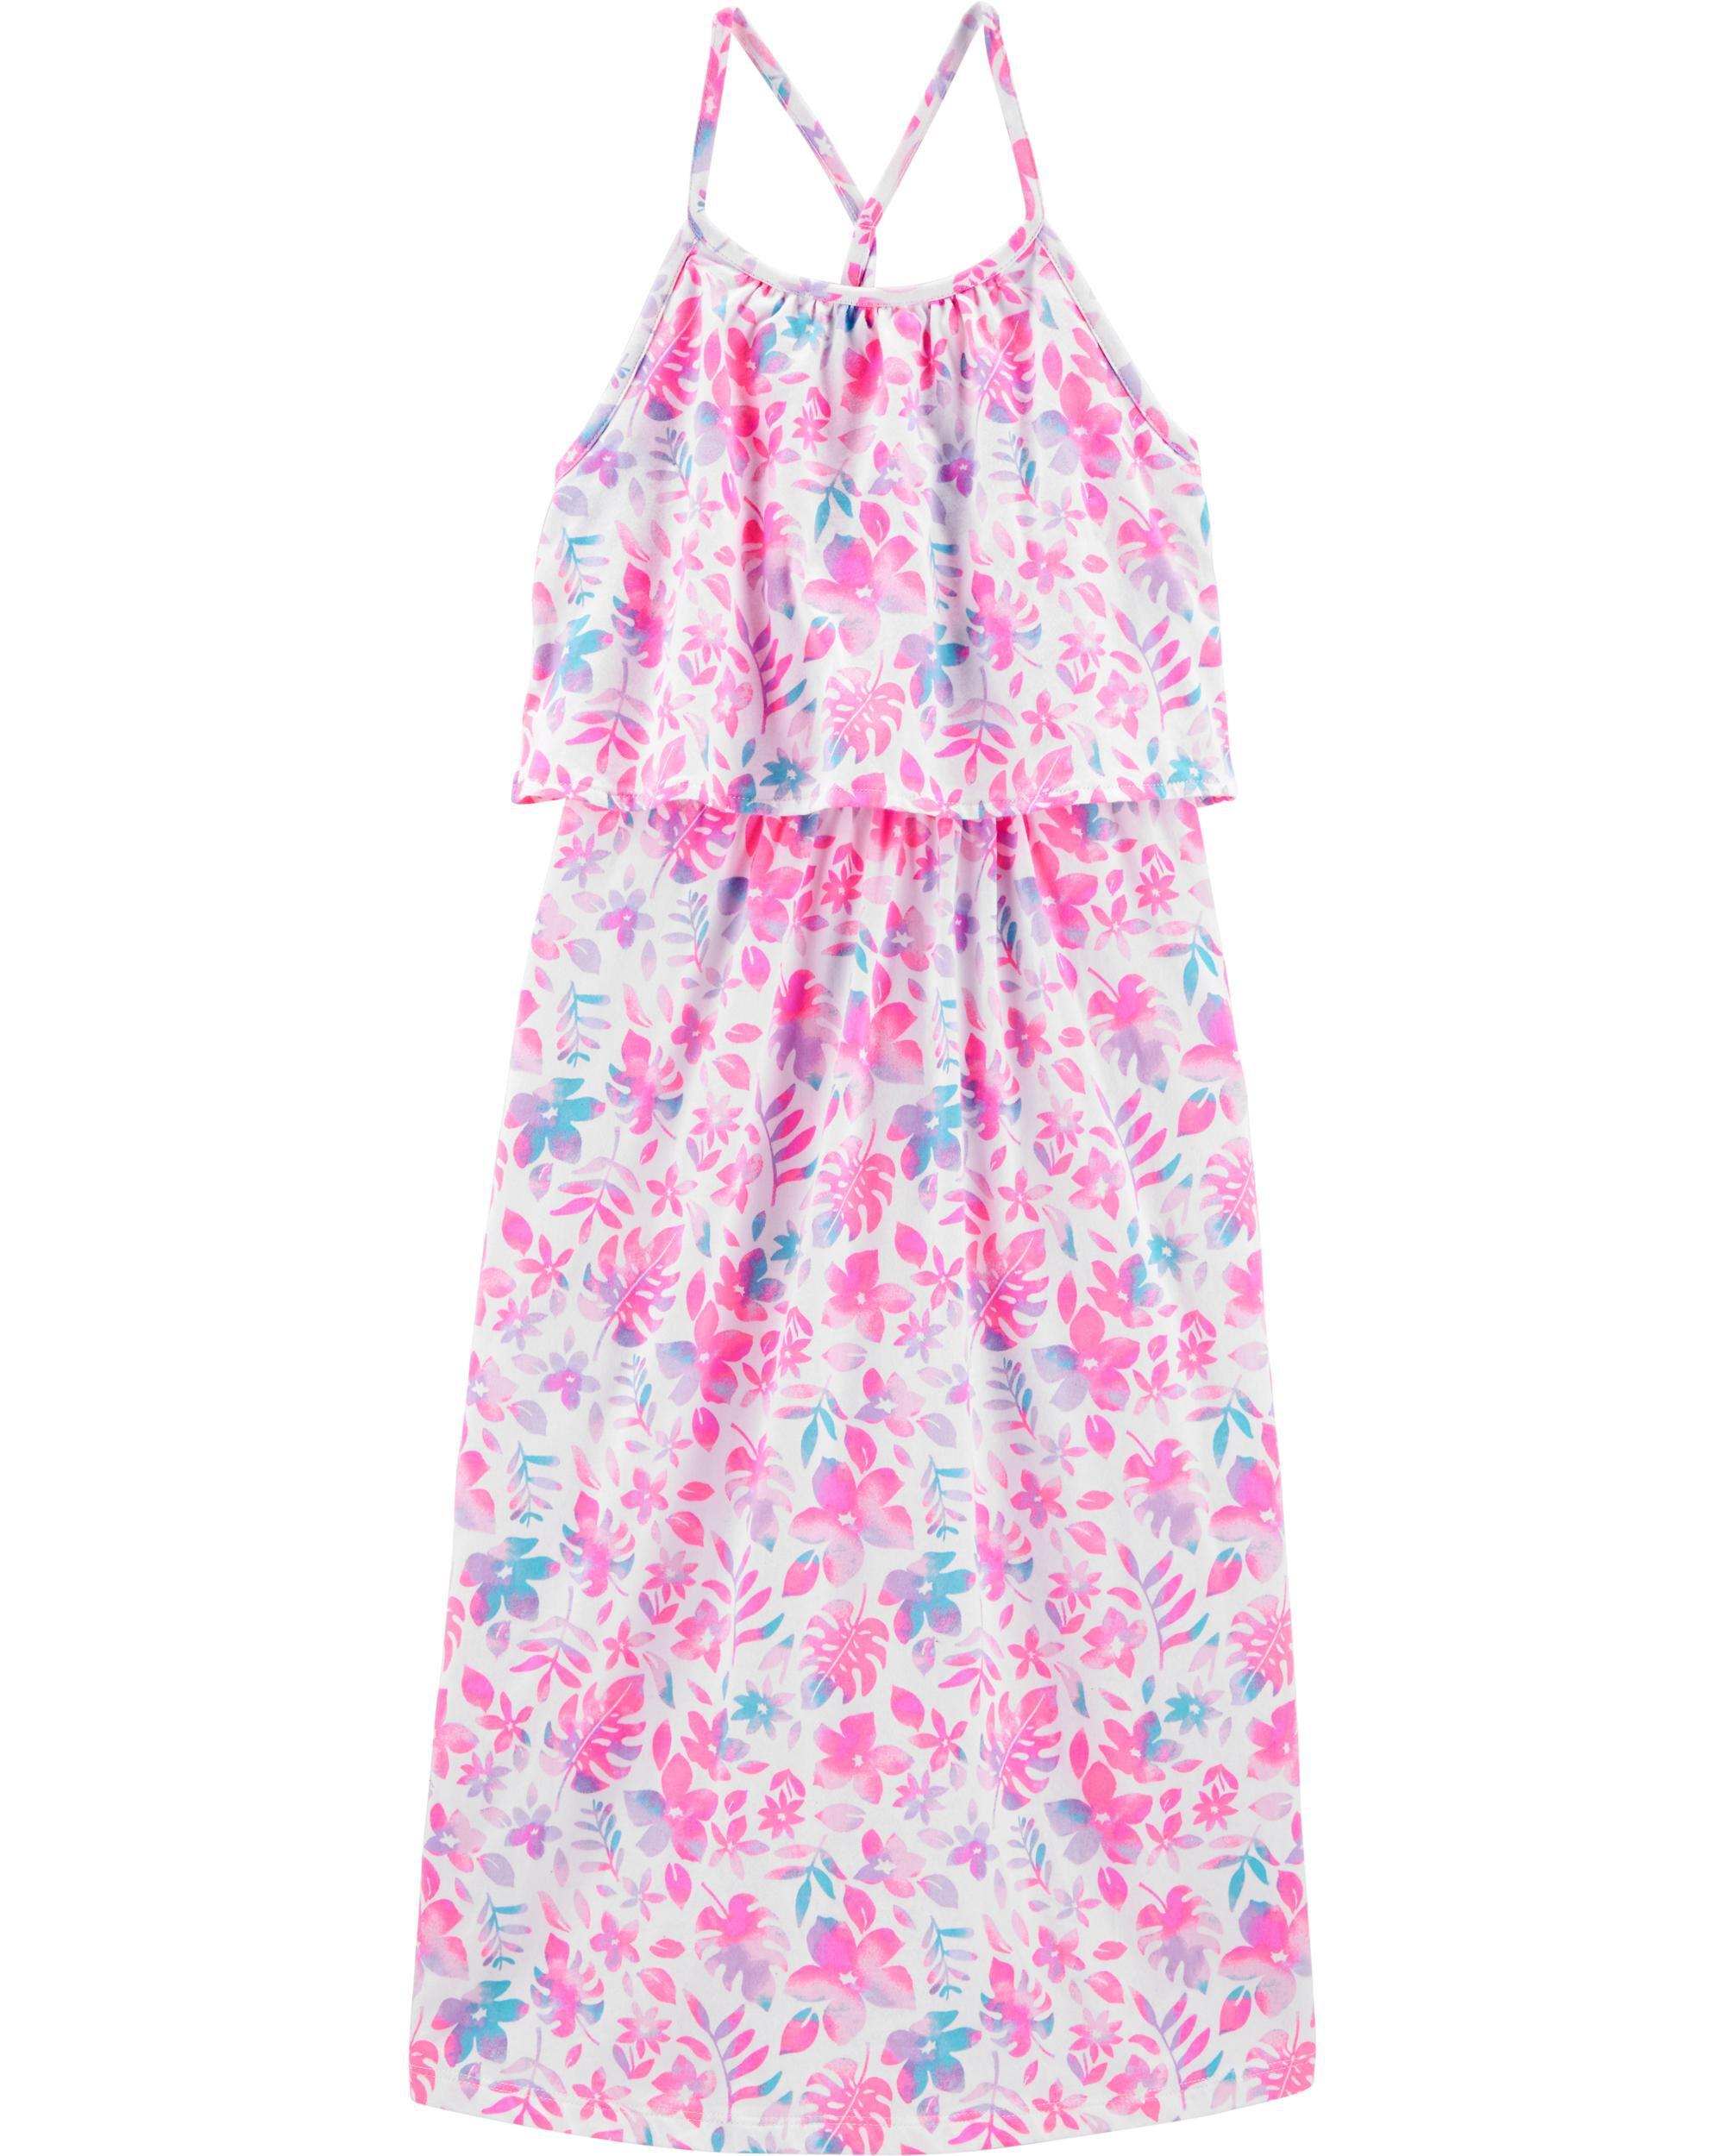 Girls Oshkosh Summer Dress Age 4 barely Worn